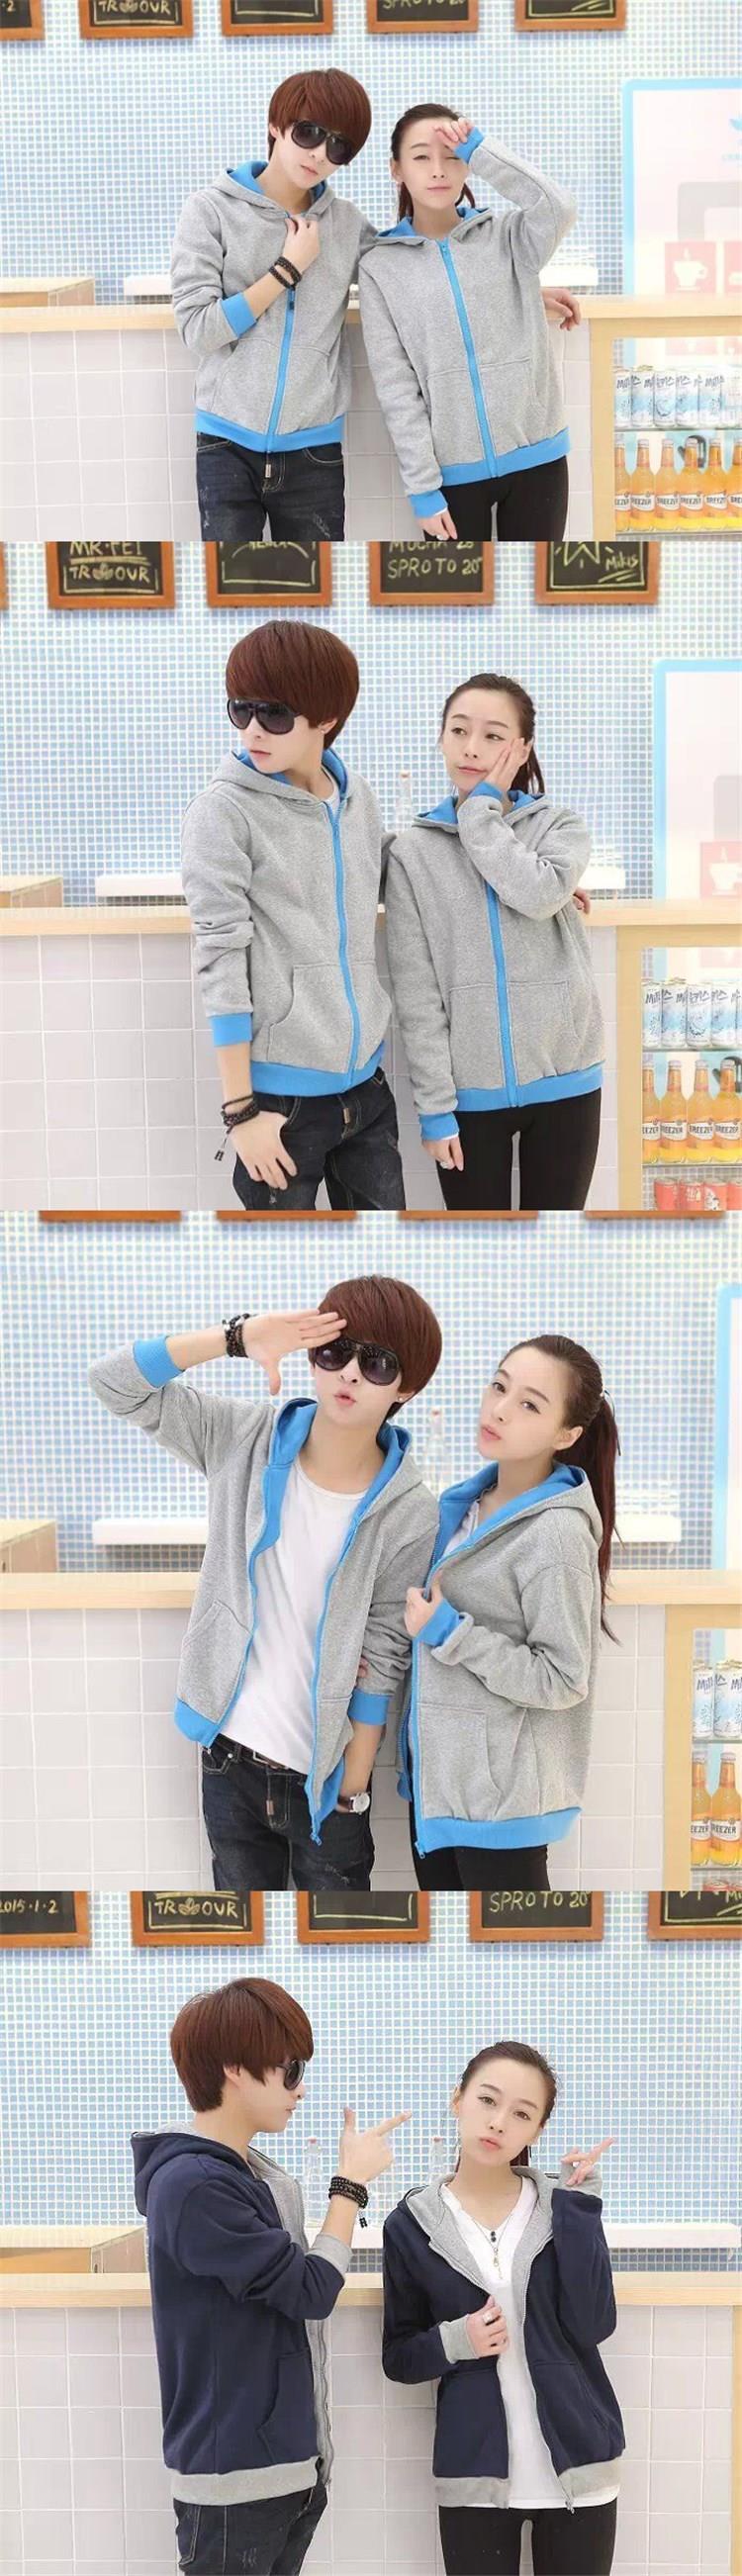 Ms0028d Korean Fashion Fall Hooded Ca End 6 8 2018 615 Pm Black Blazer Jaket Korea Style Sk 15 Casual Students Jacket